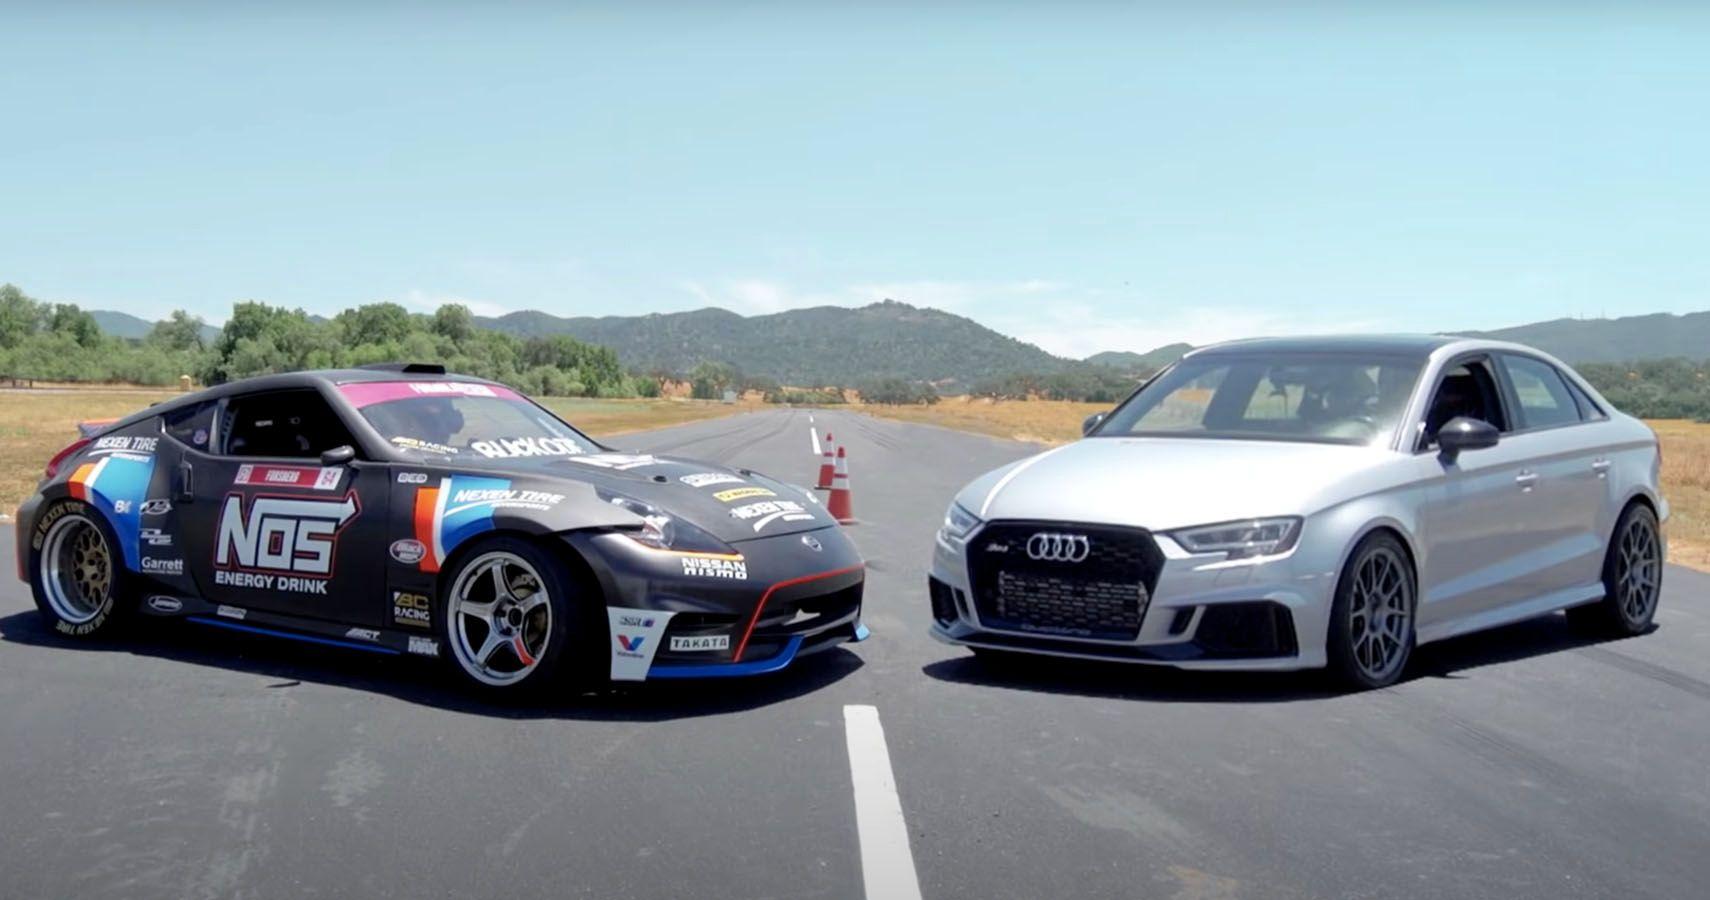 Watch The Hoonigans Race A Nissan 370Z Drifter Vs A Tuned Audi RS3